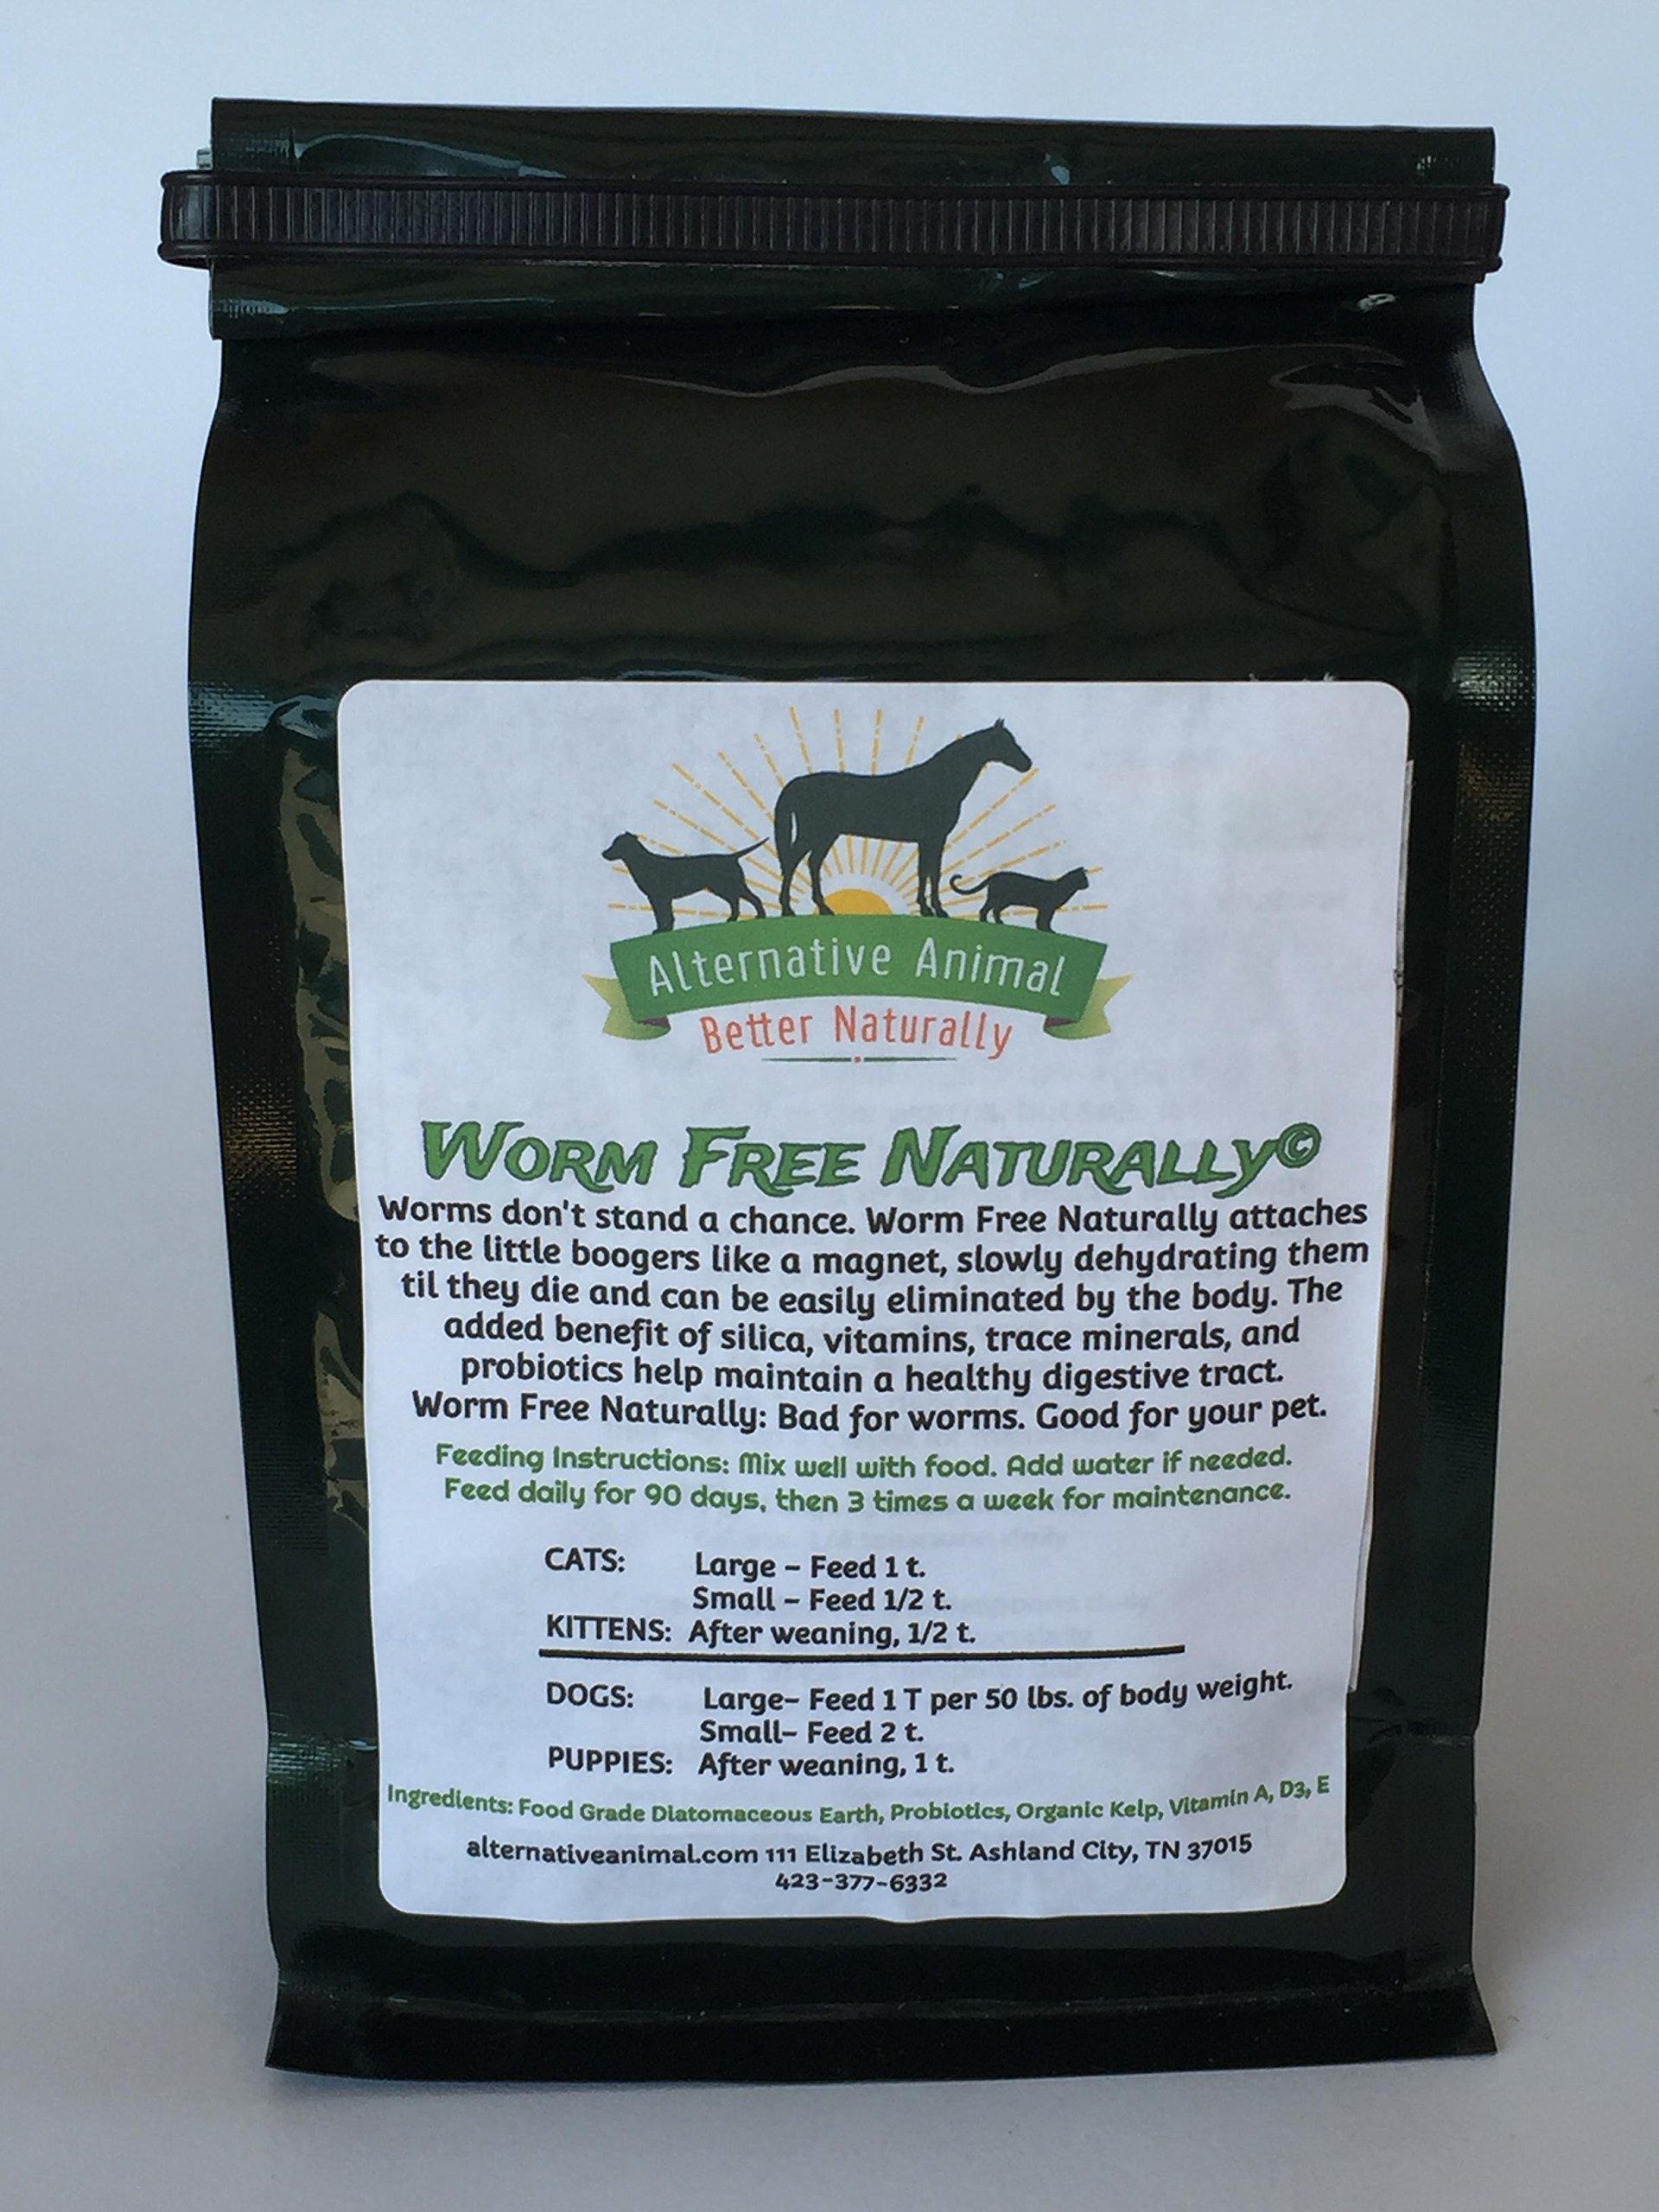 Alternative Animal Wormfree Naturally-Natural Dog Wormer